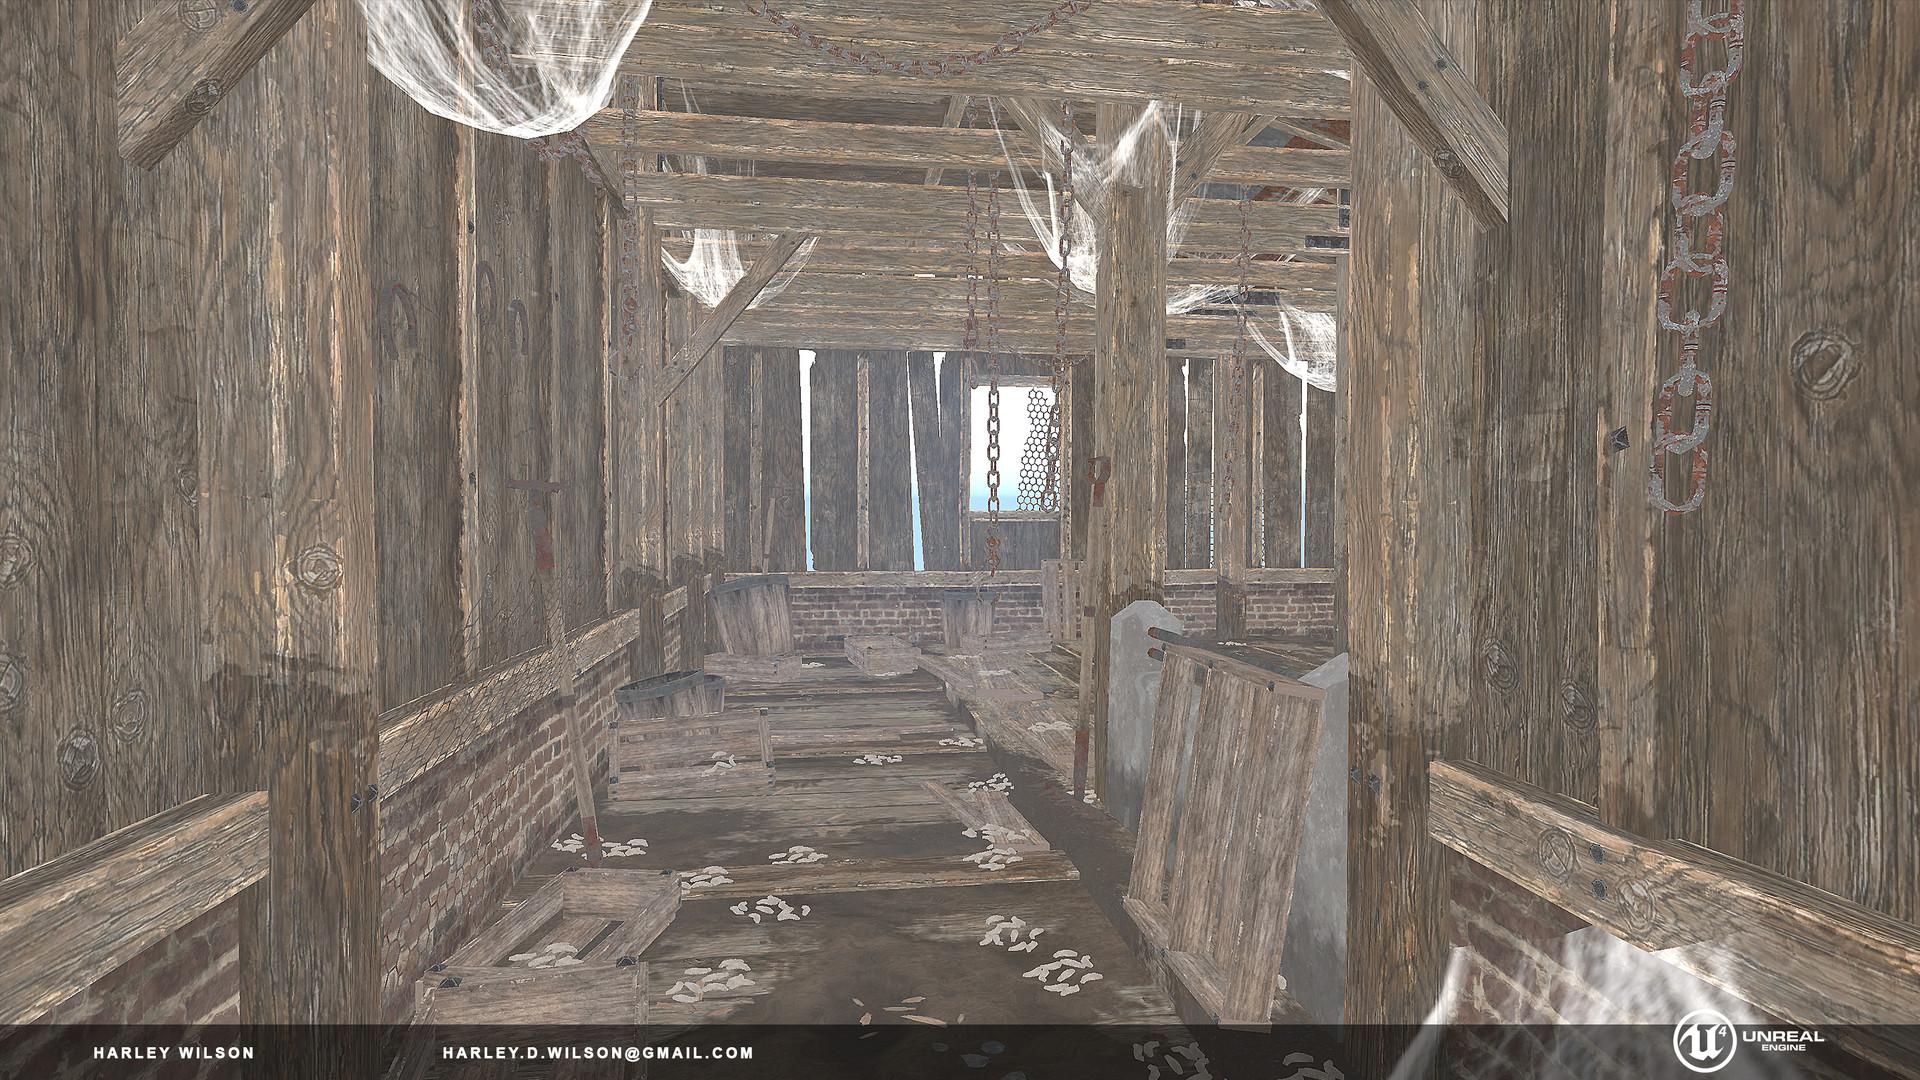 Harley wilson farmhouse albedo